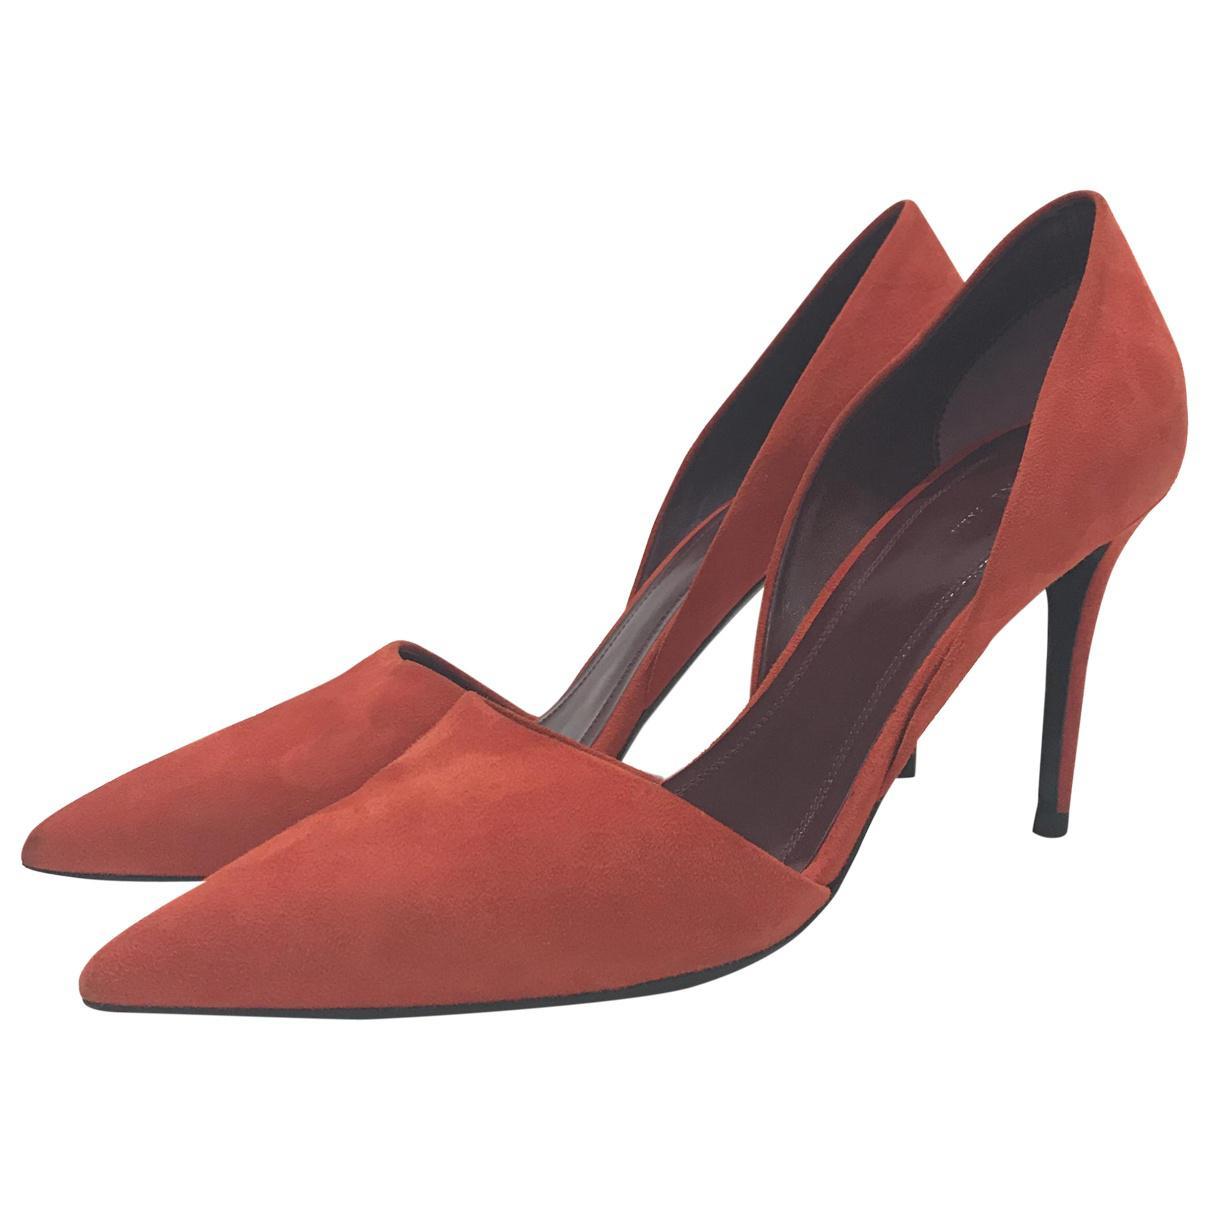 Pre-owned - Heels Celine Tl7tiii